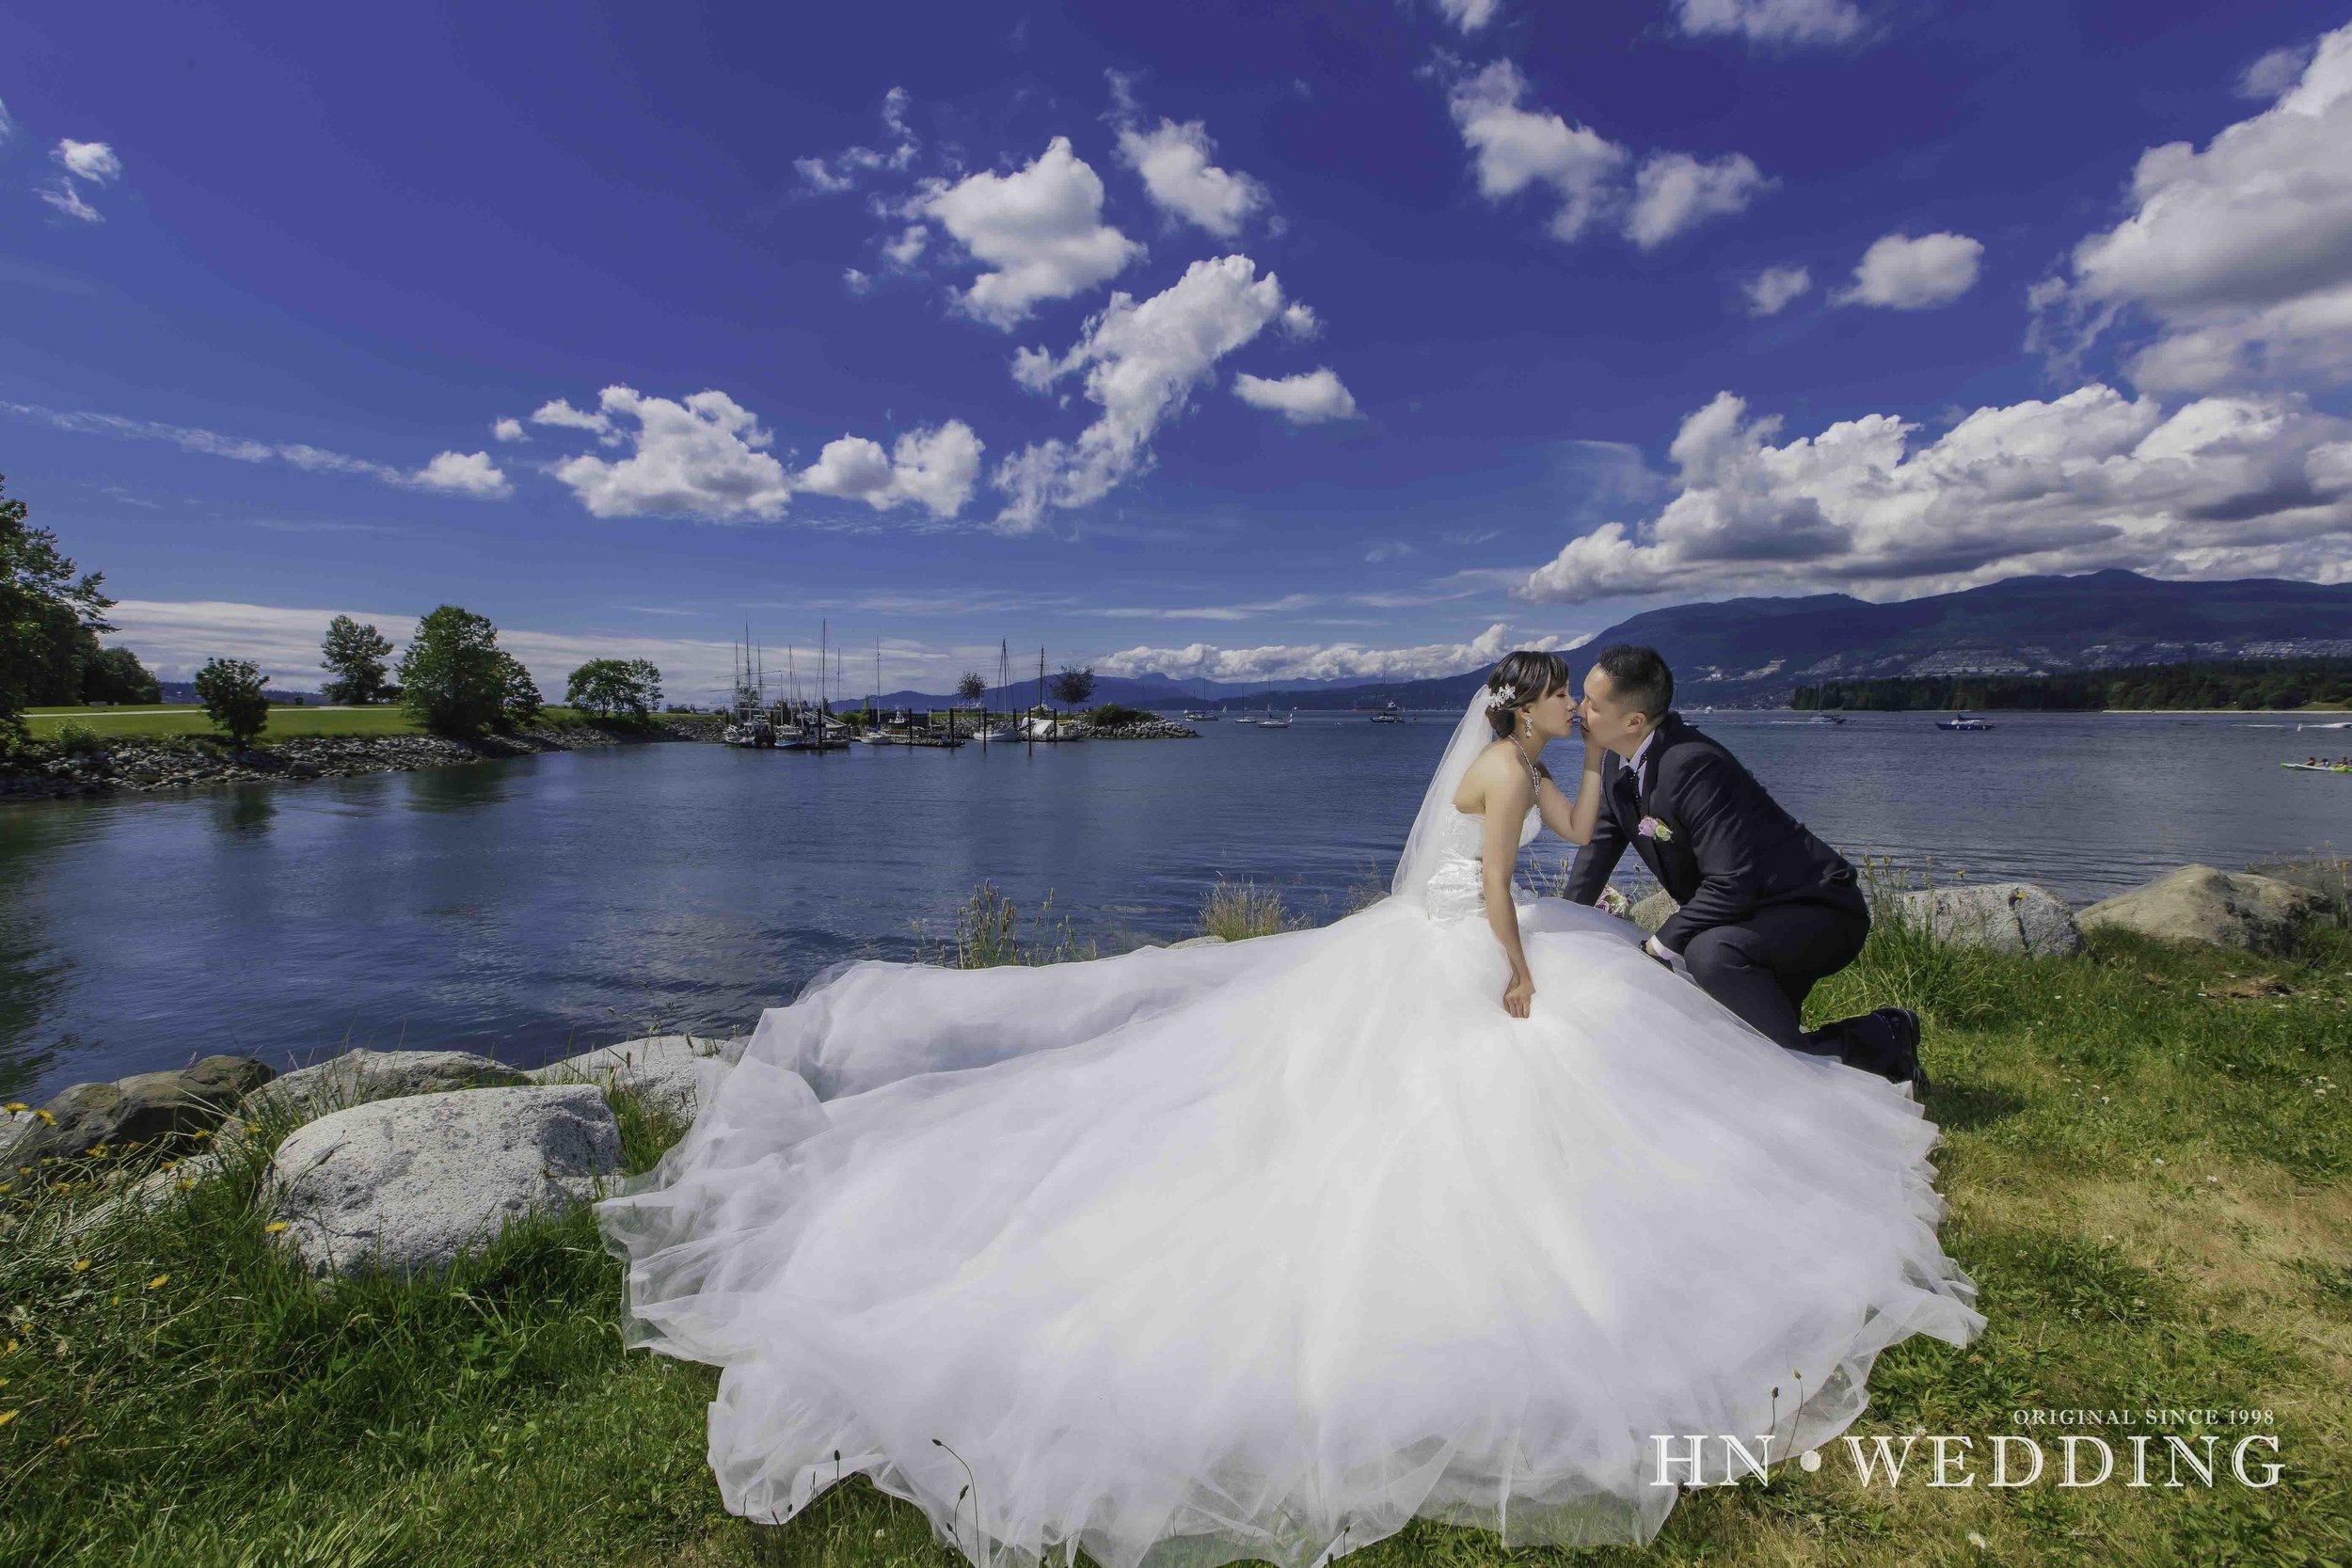 HNwedding-20160822-wedding-6537.jpg